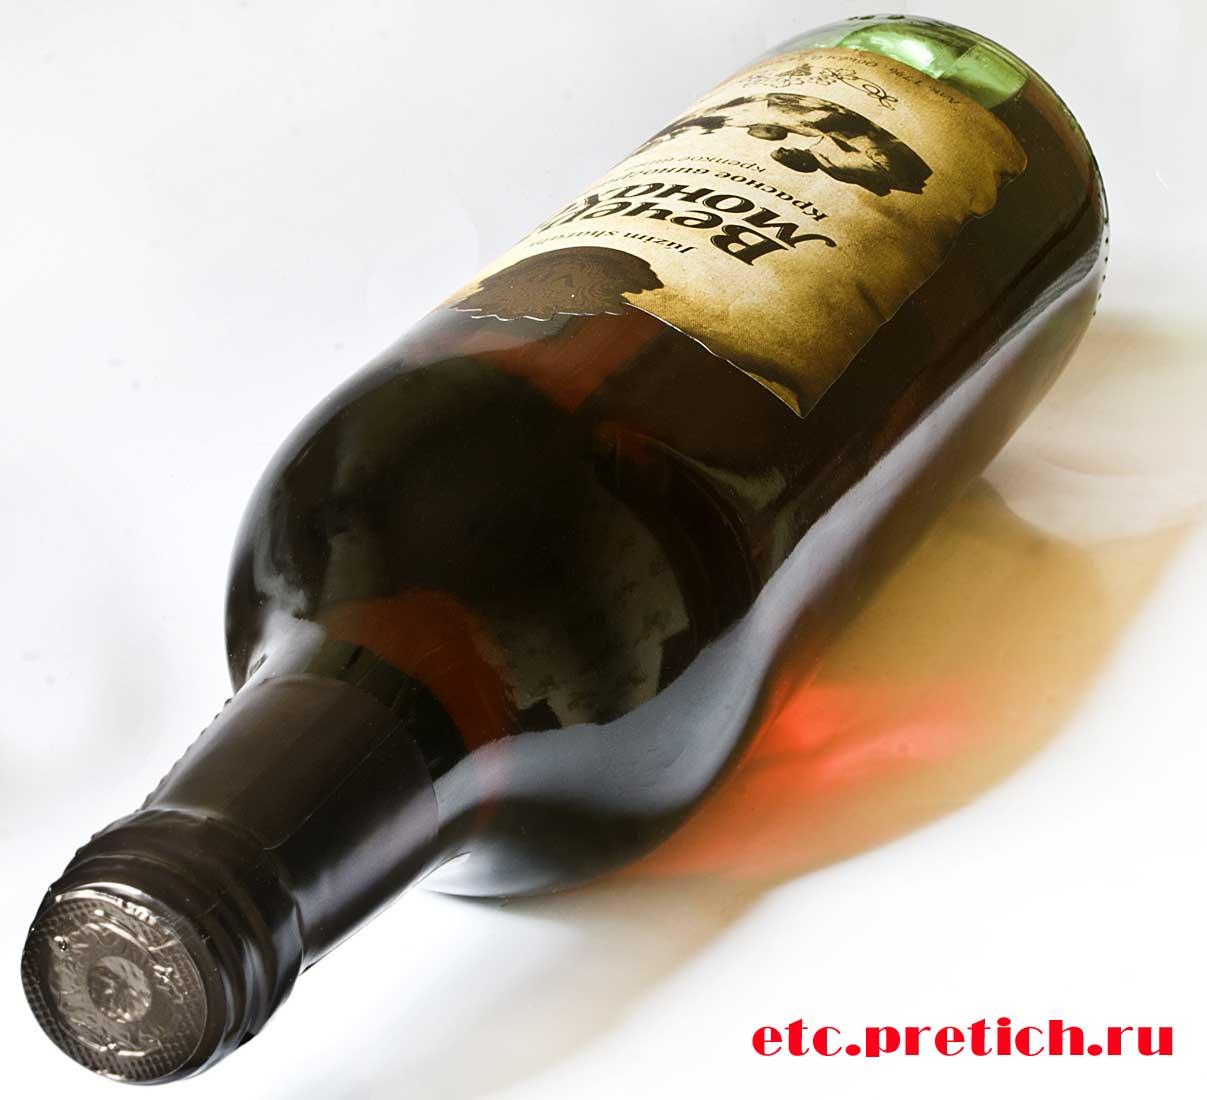 Вечеря монахов крепленое вино, Казахстан - цена 300 тенге